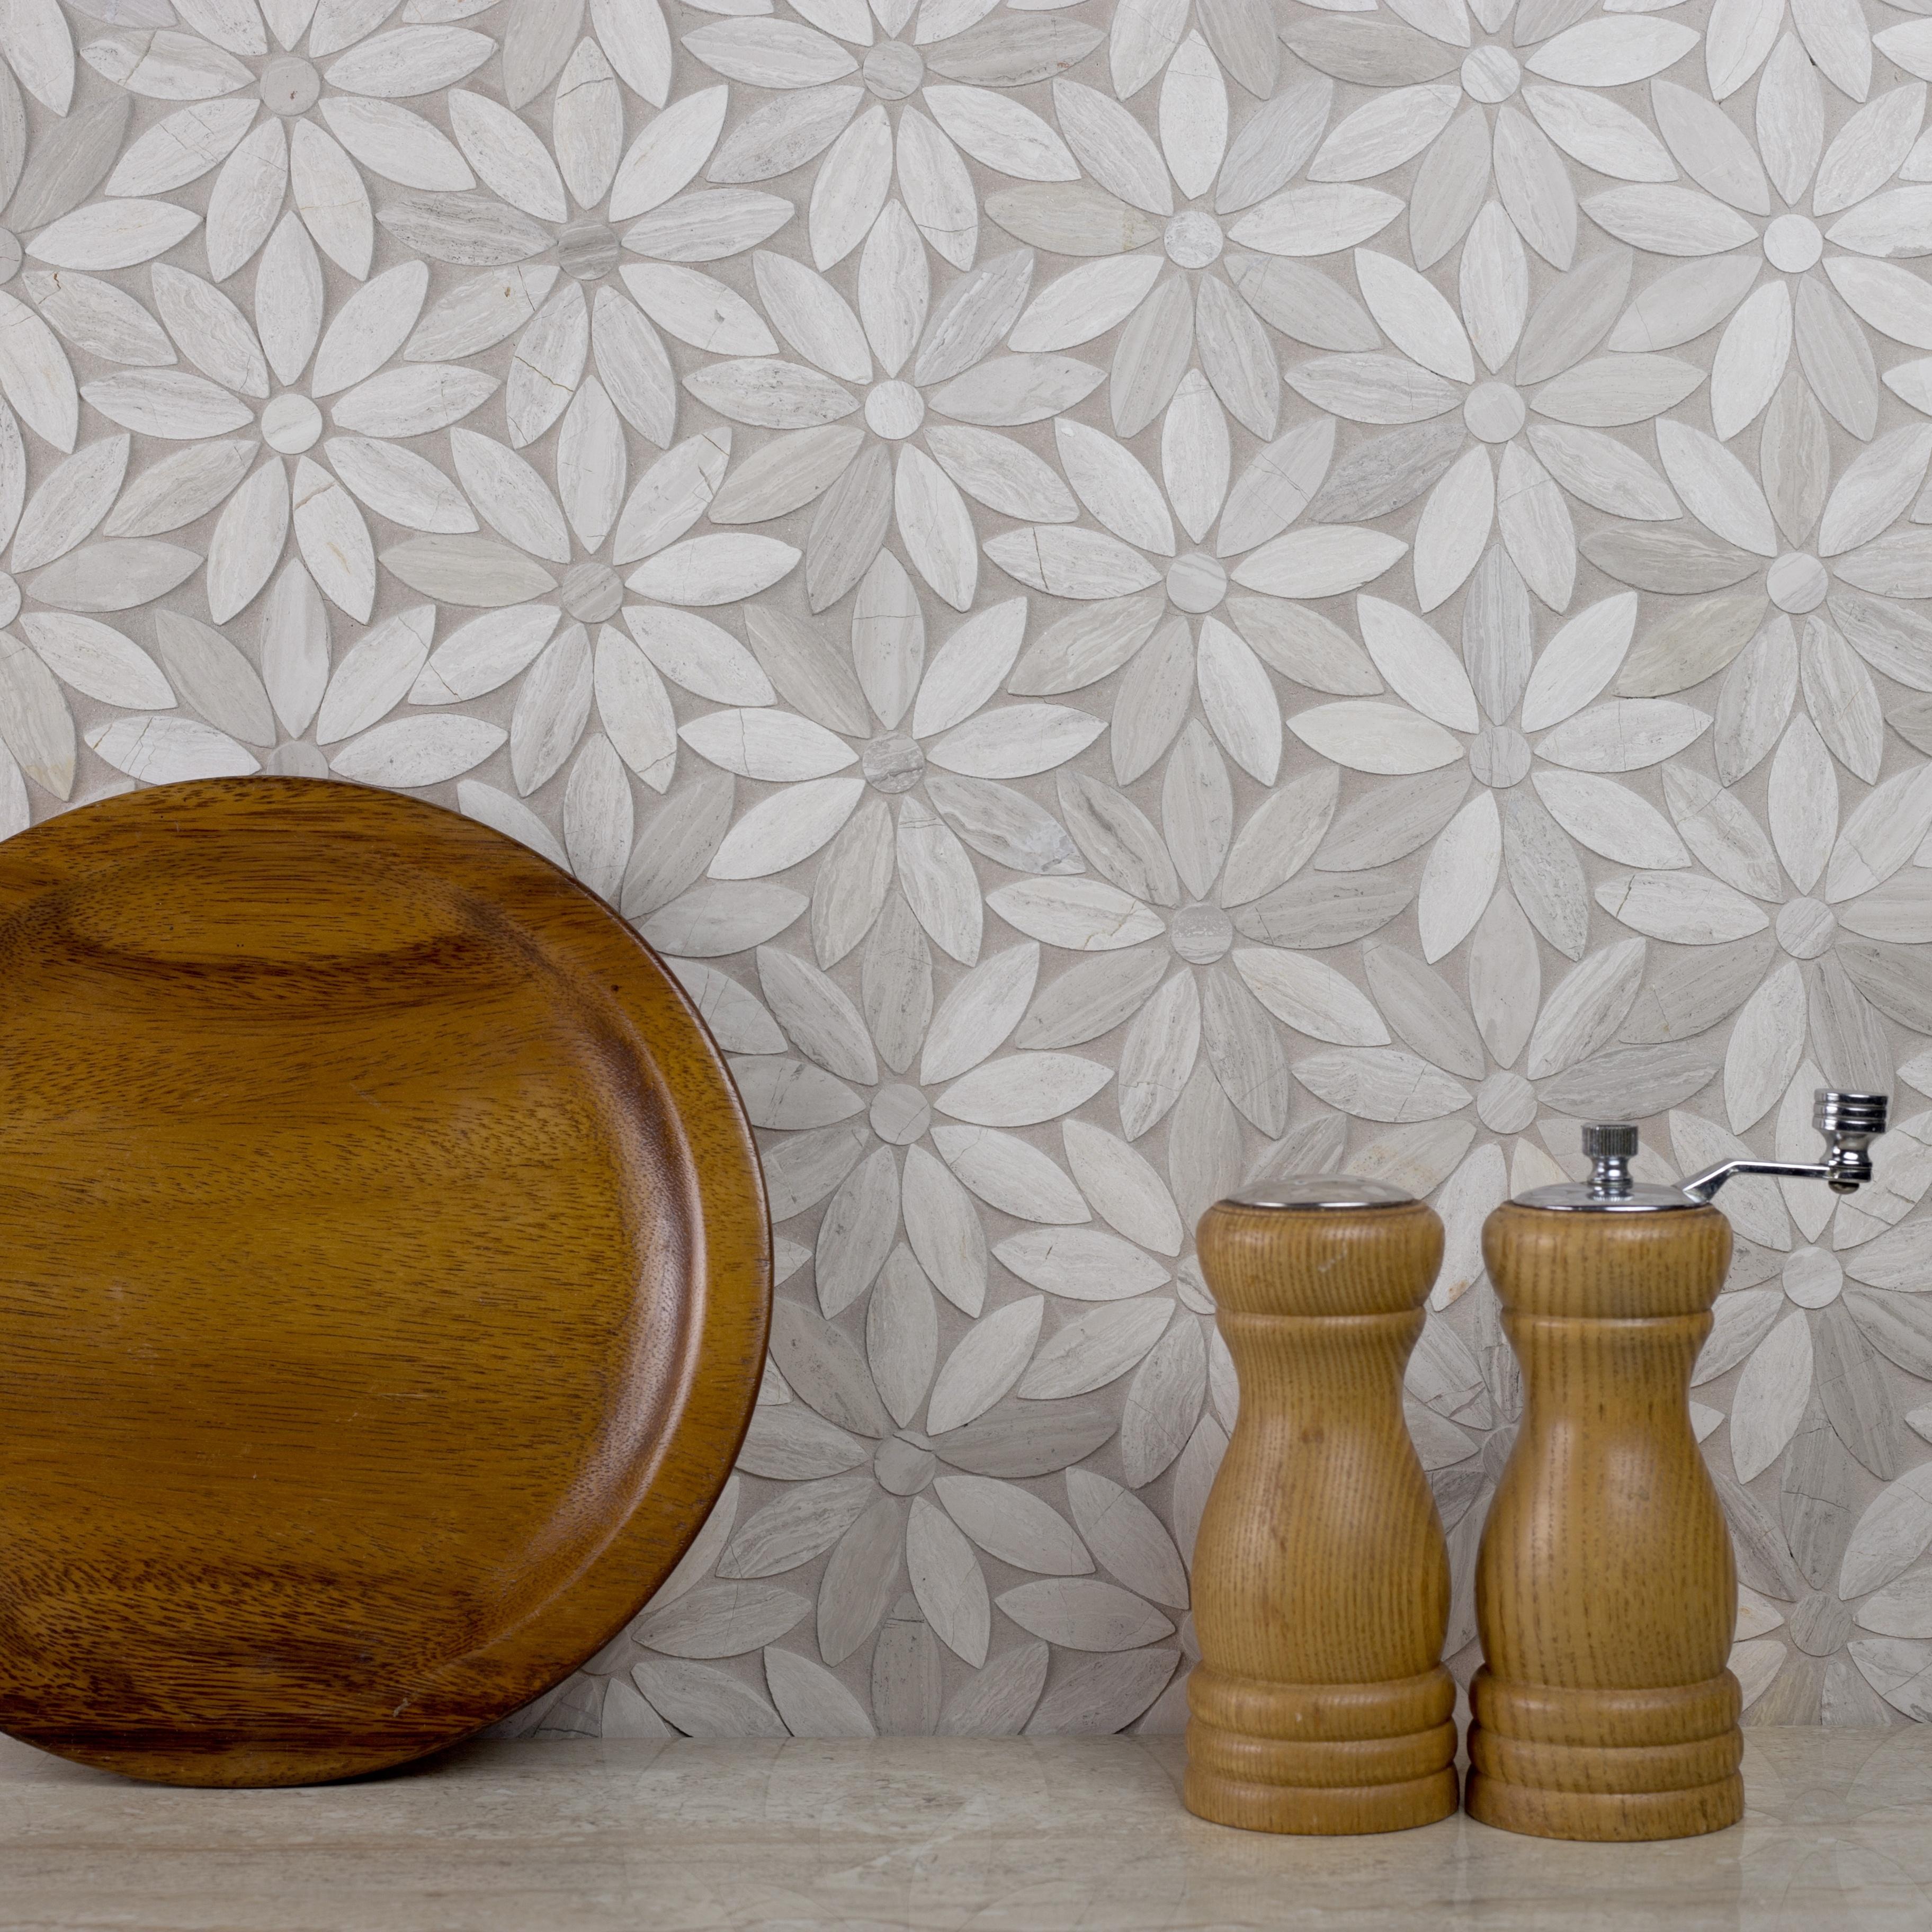 Marble 4 in x 4 in Marble Flower Waterjet Mosaic in ROYAL BEIGE Simi-Gloss